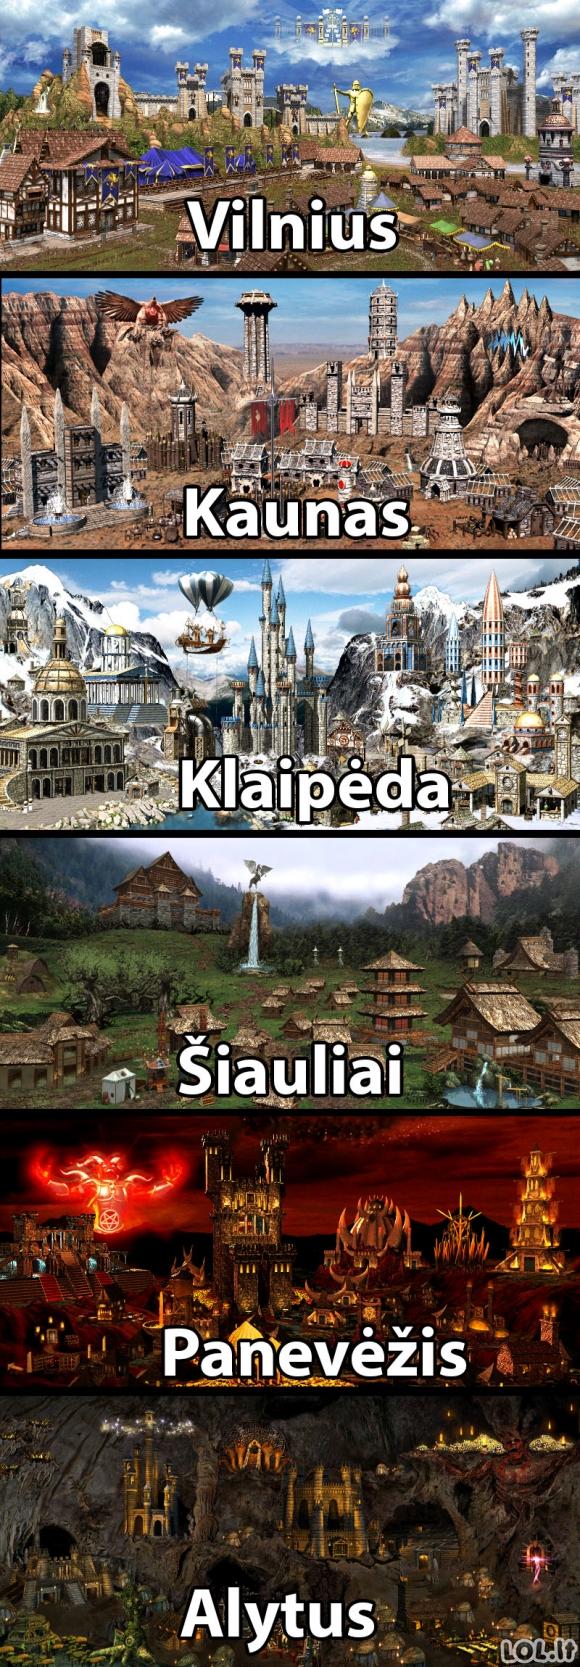 TOP 6 Lietuvos miestai pagal Heroes 3